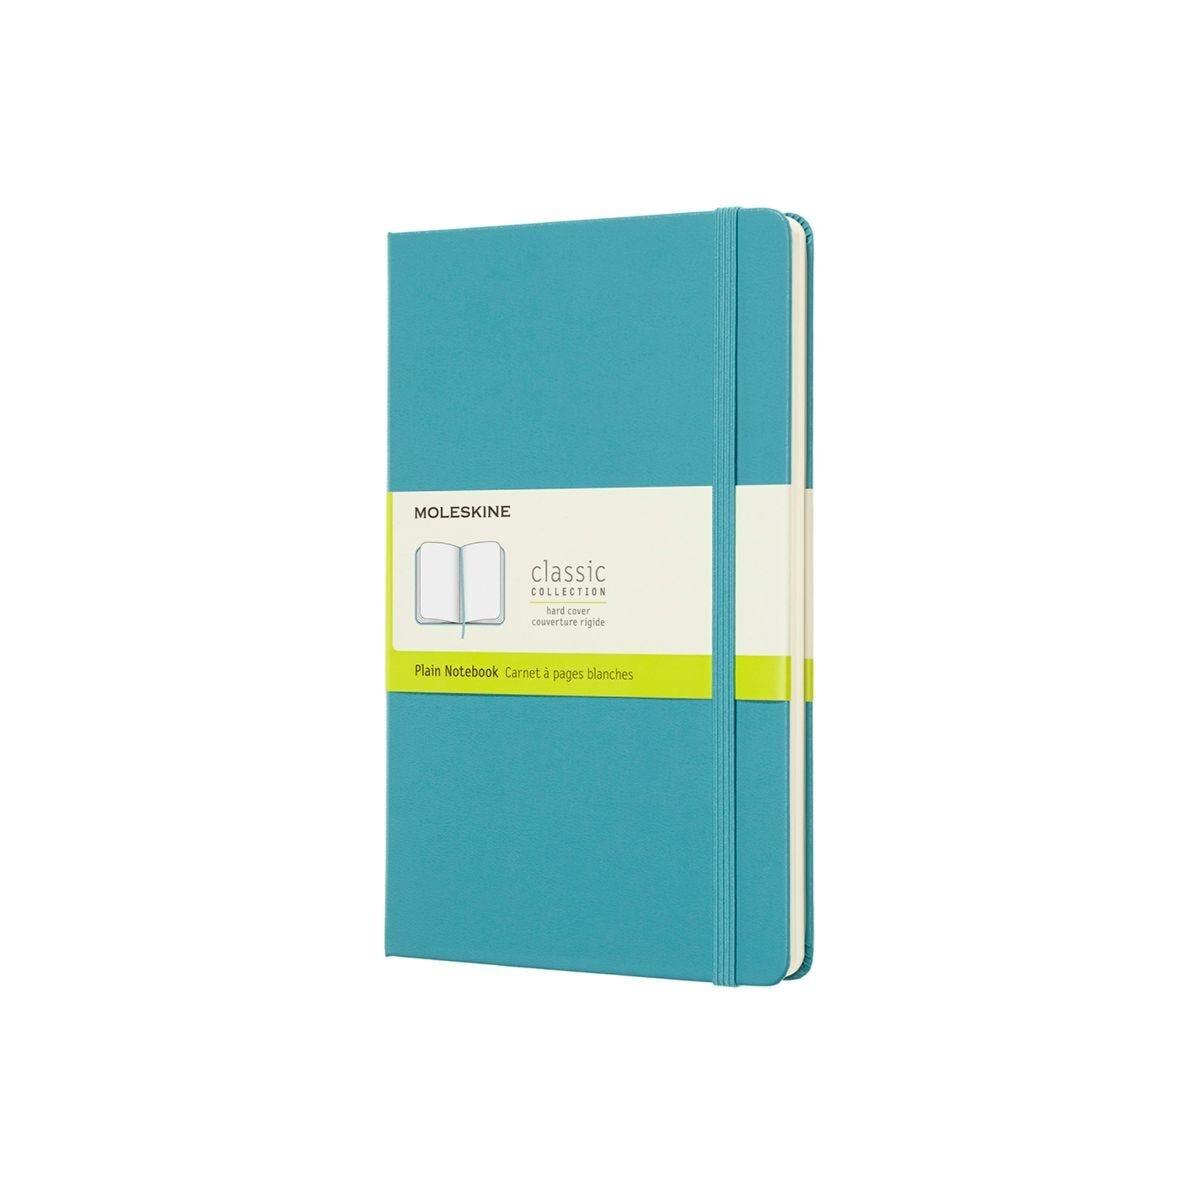 Moleskine Hard Cover Classic Notebook Large Plain Light Blue